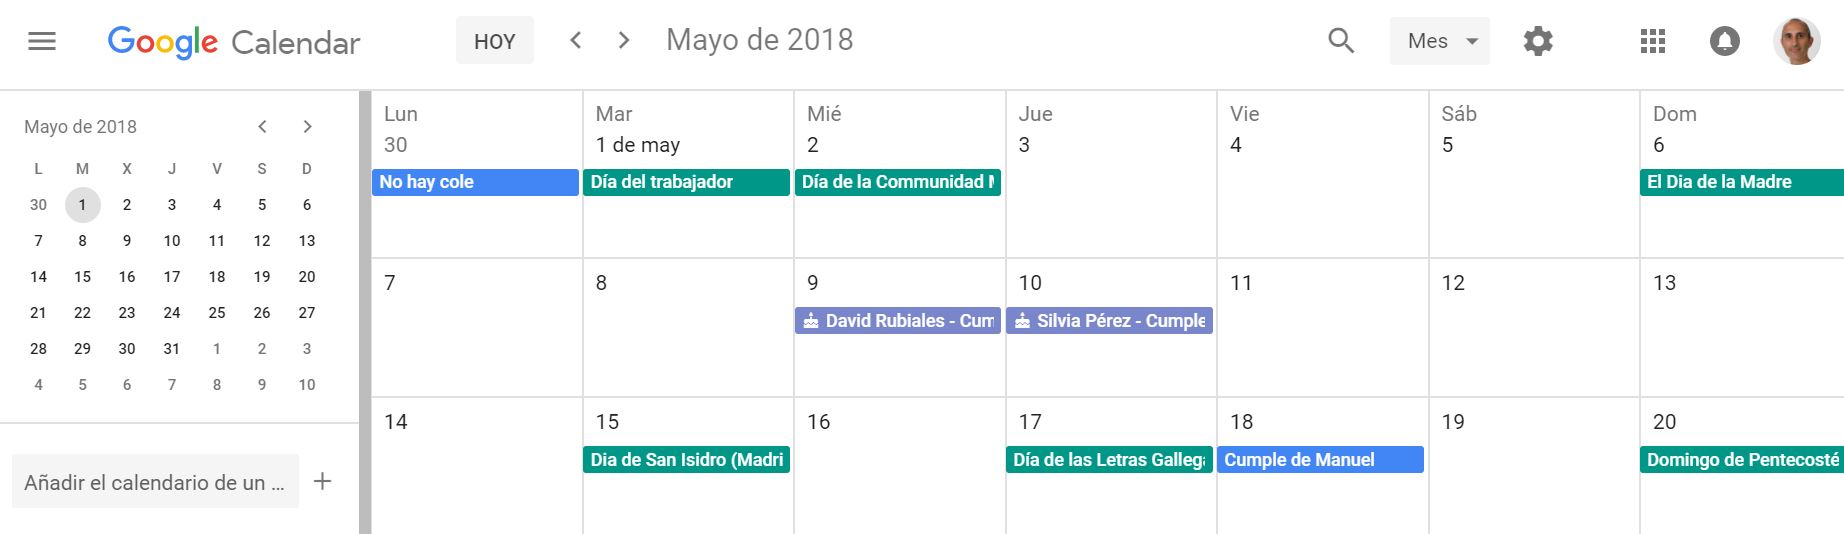 Google Calendar nuevo diseño